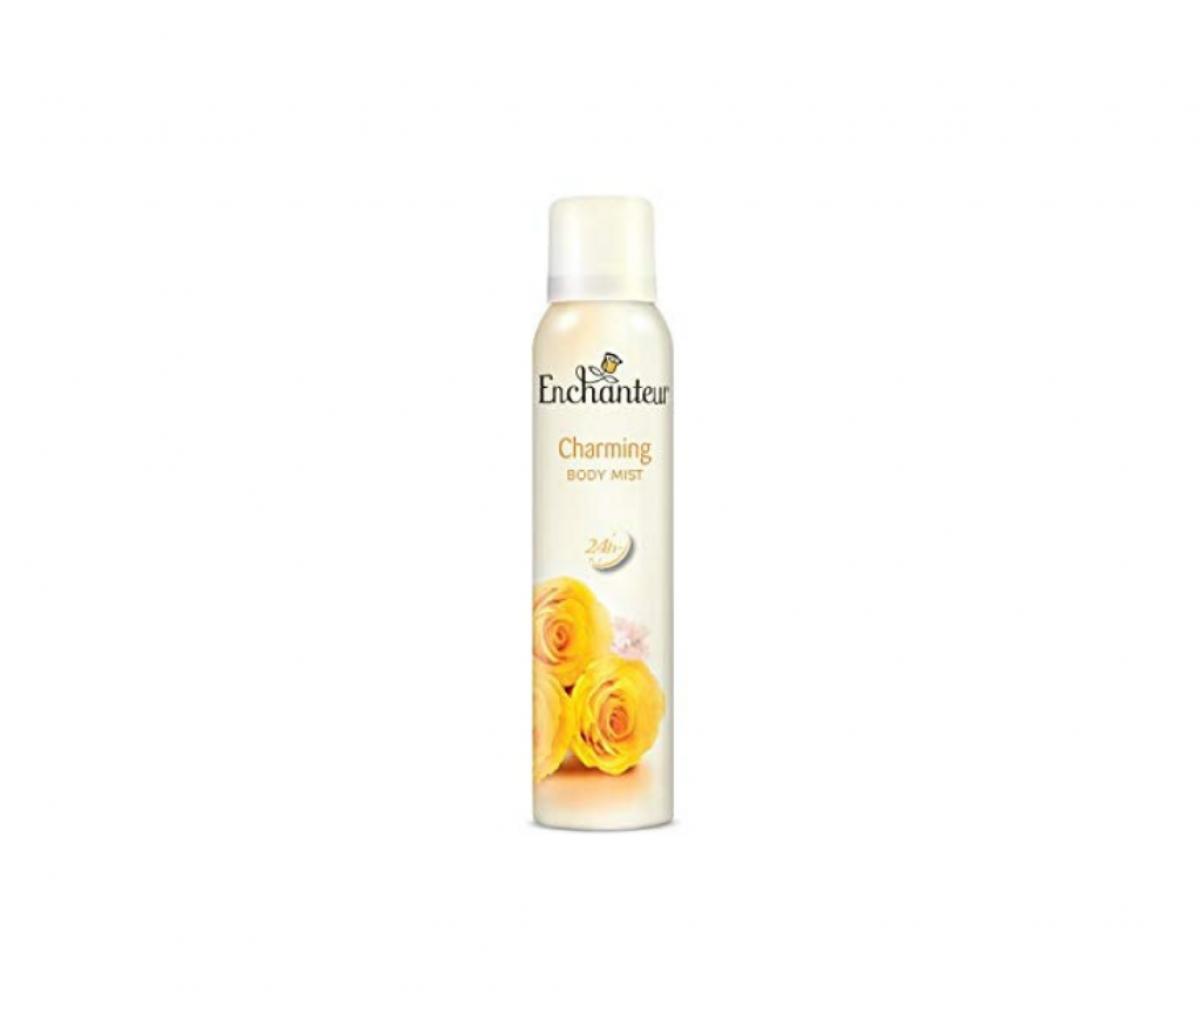 Enchanteur Deodorant 150ml Charming